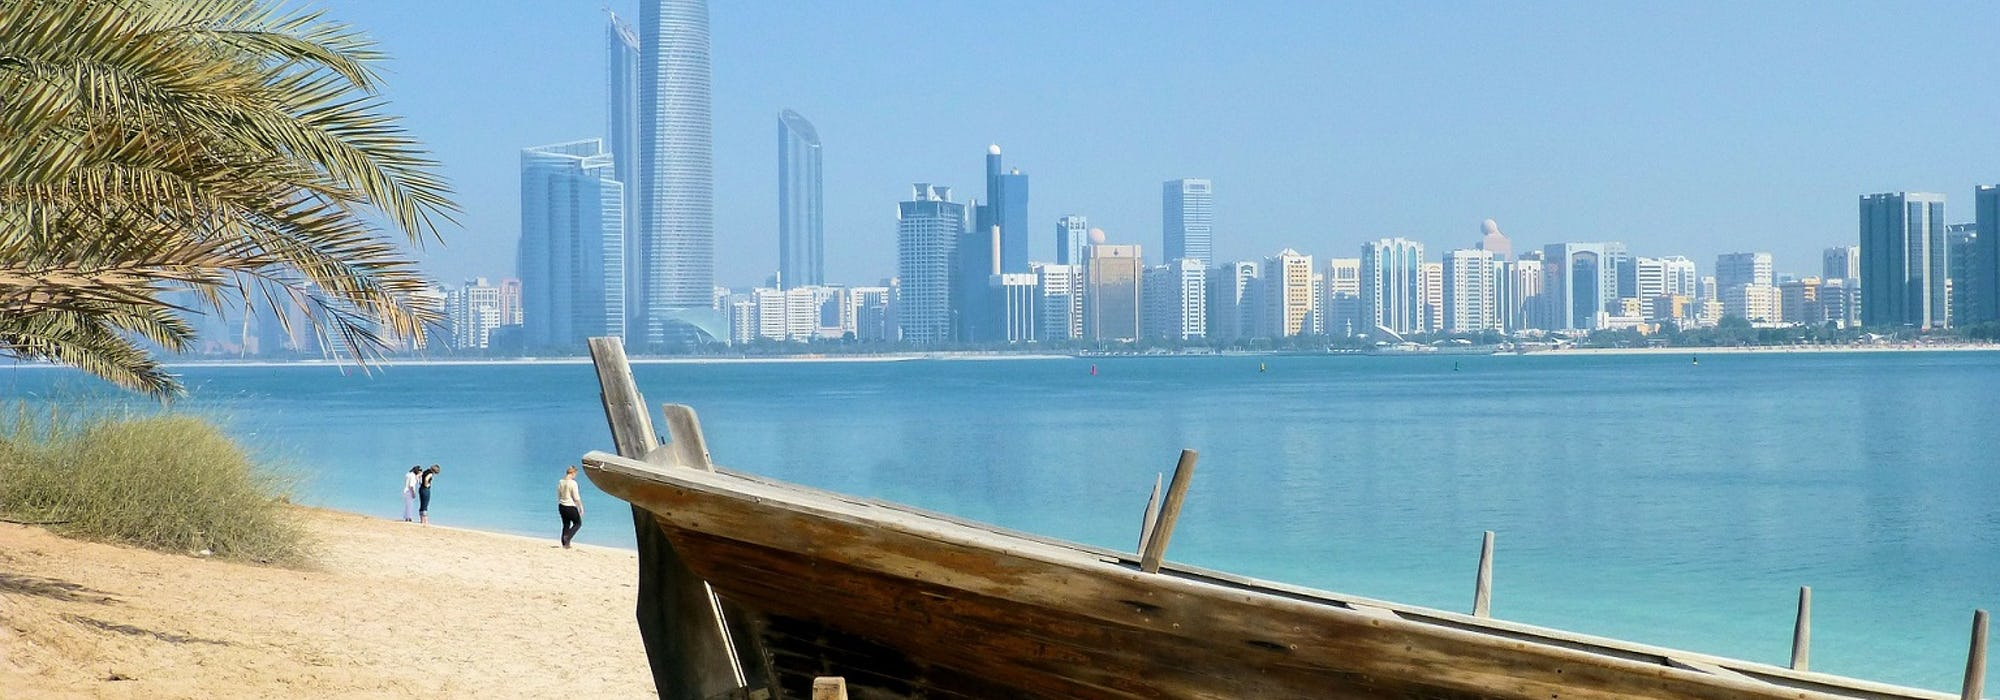 Dubai kryssning